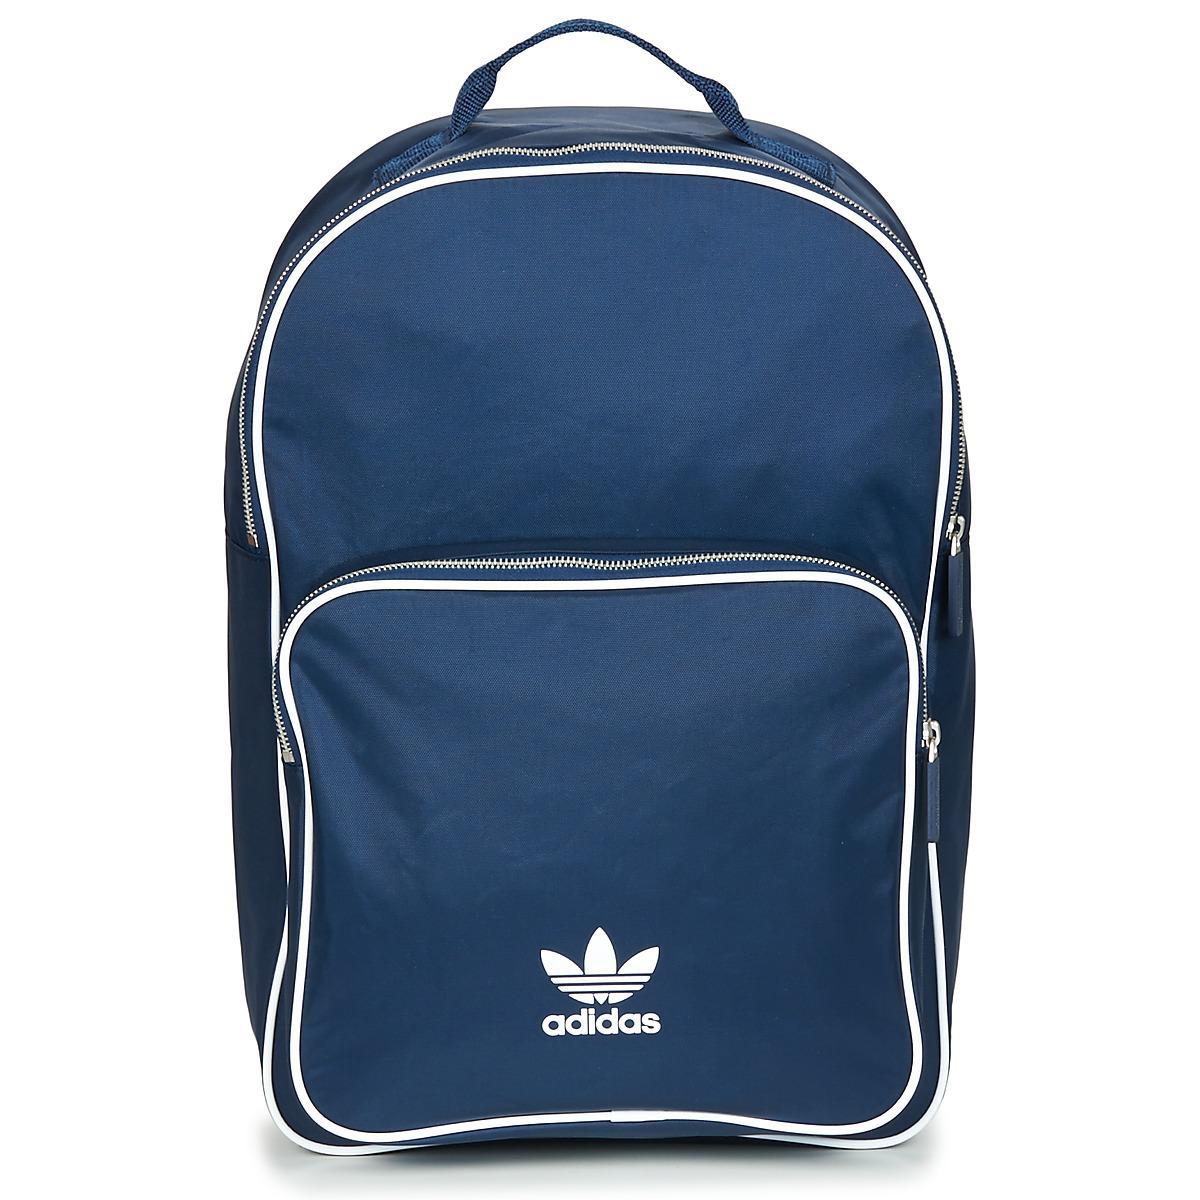 Adidas Bp Cl Adicolor Men s Backpack In Blue in Blue for Men - Lyst bf9356dbd6f18